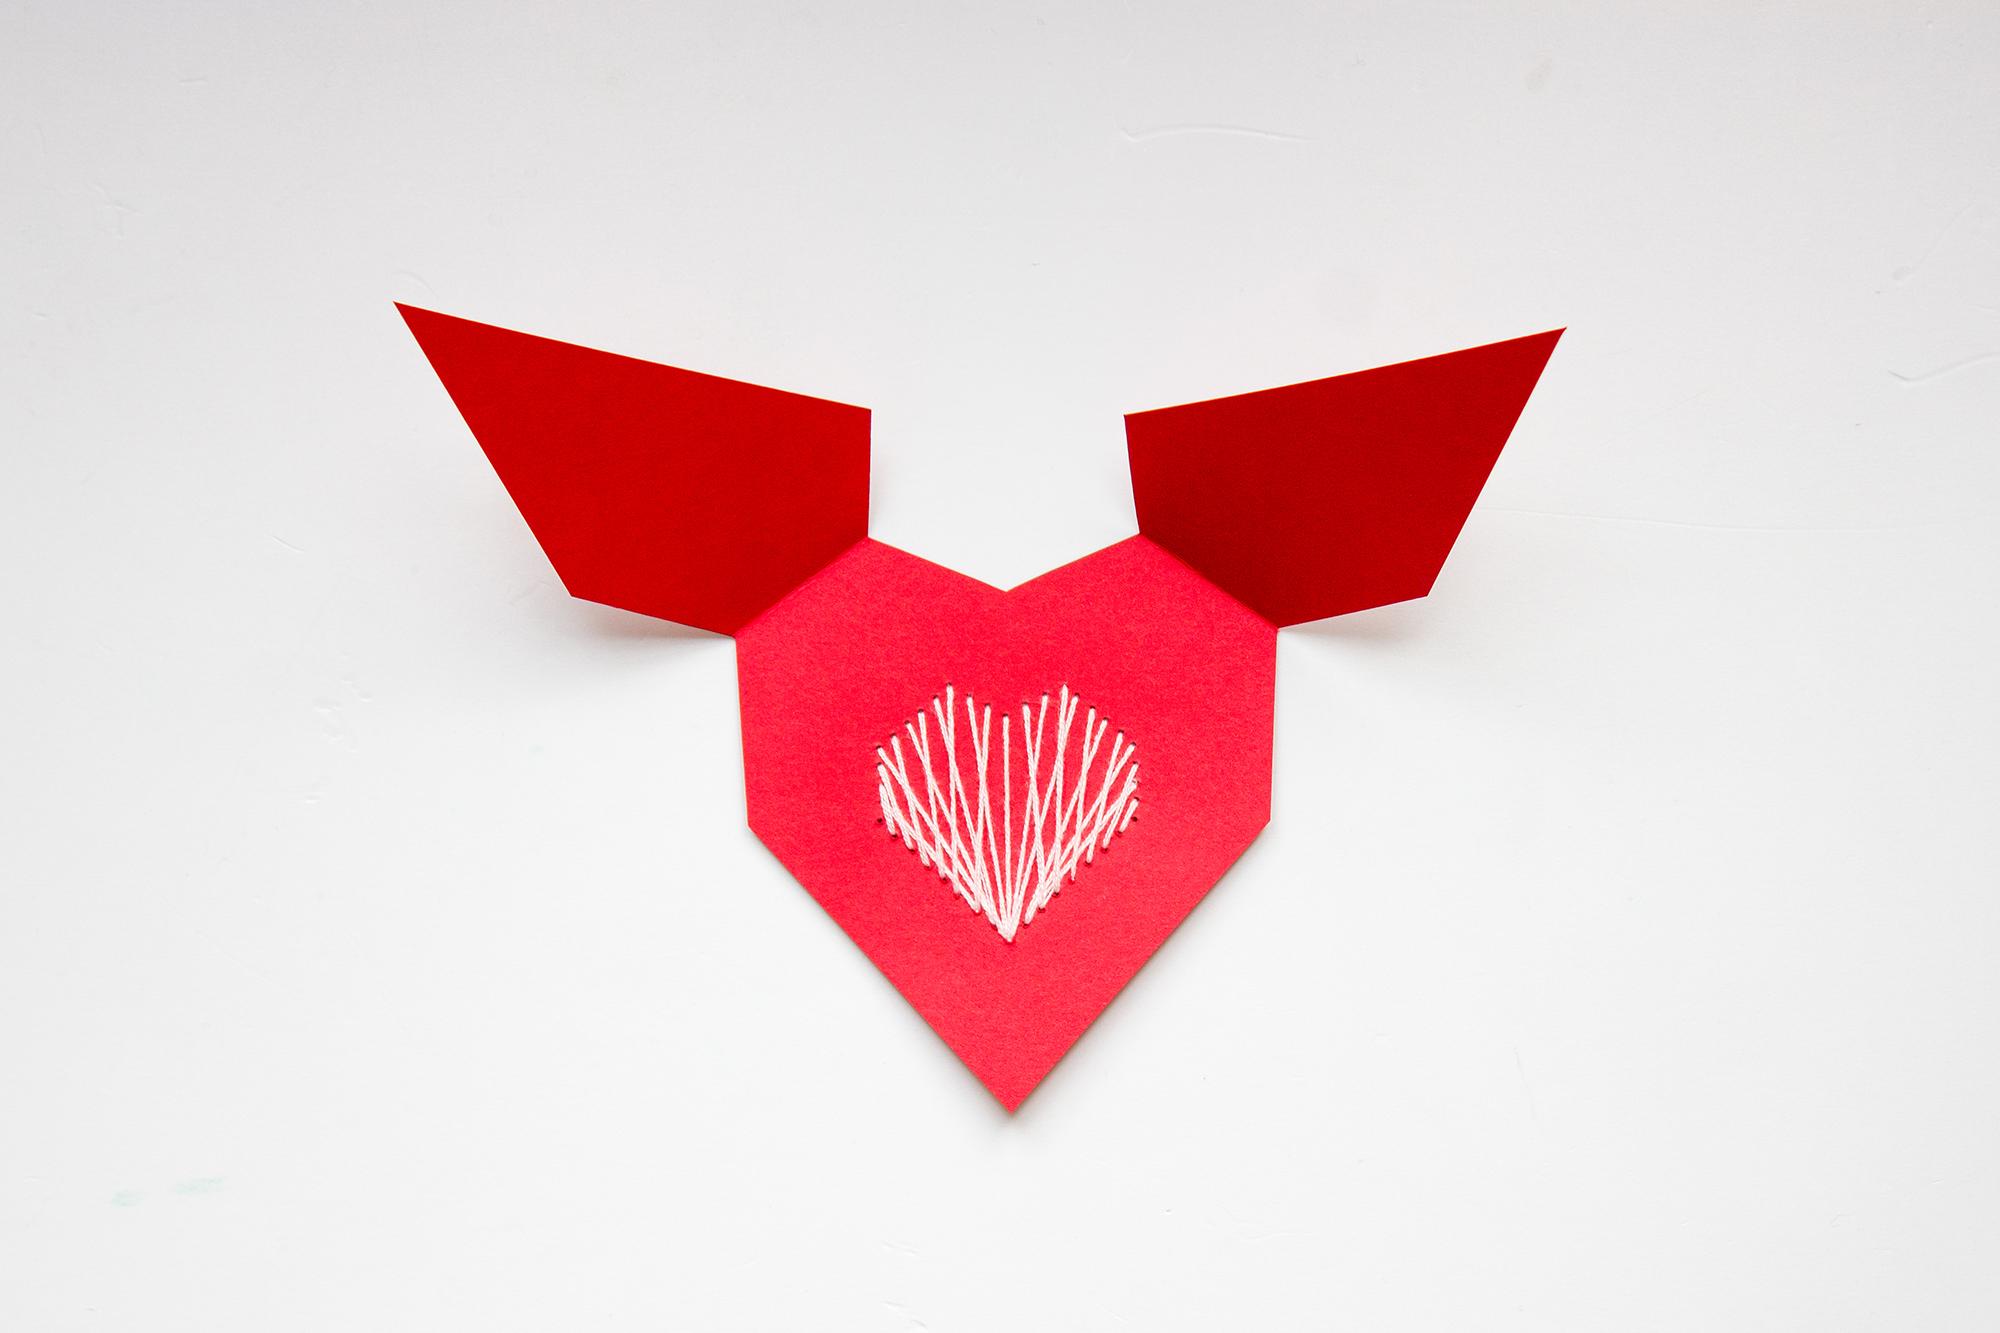 Carte de Saint Valentin brodée forme de coeur